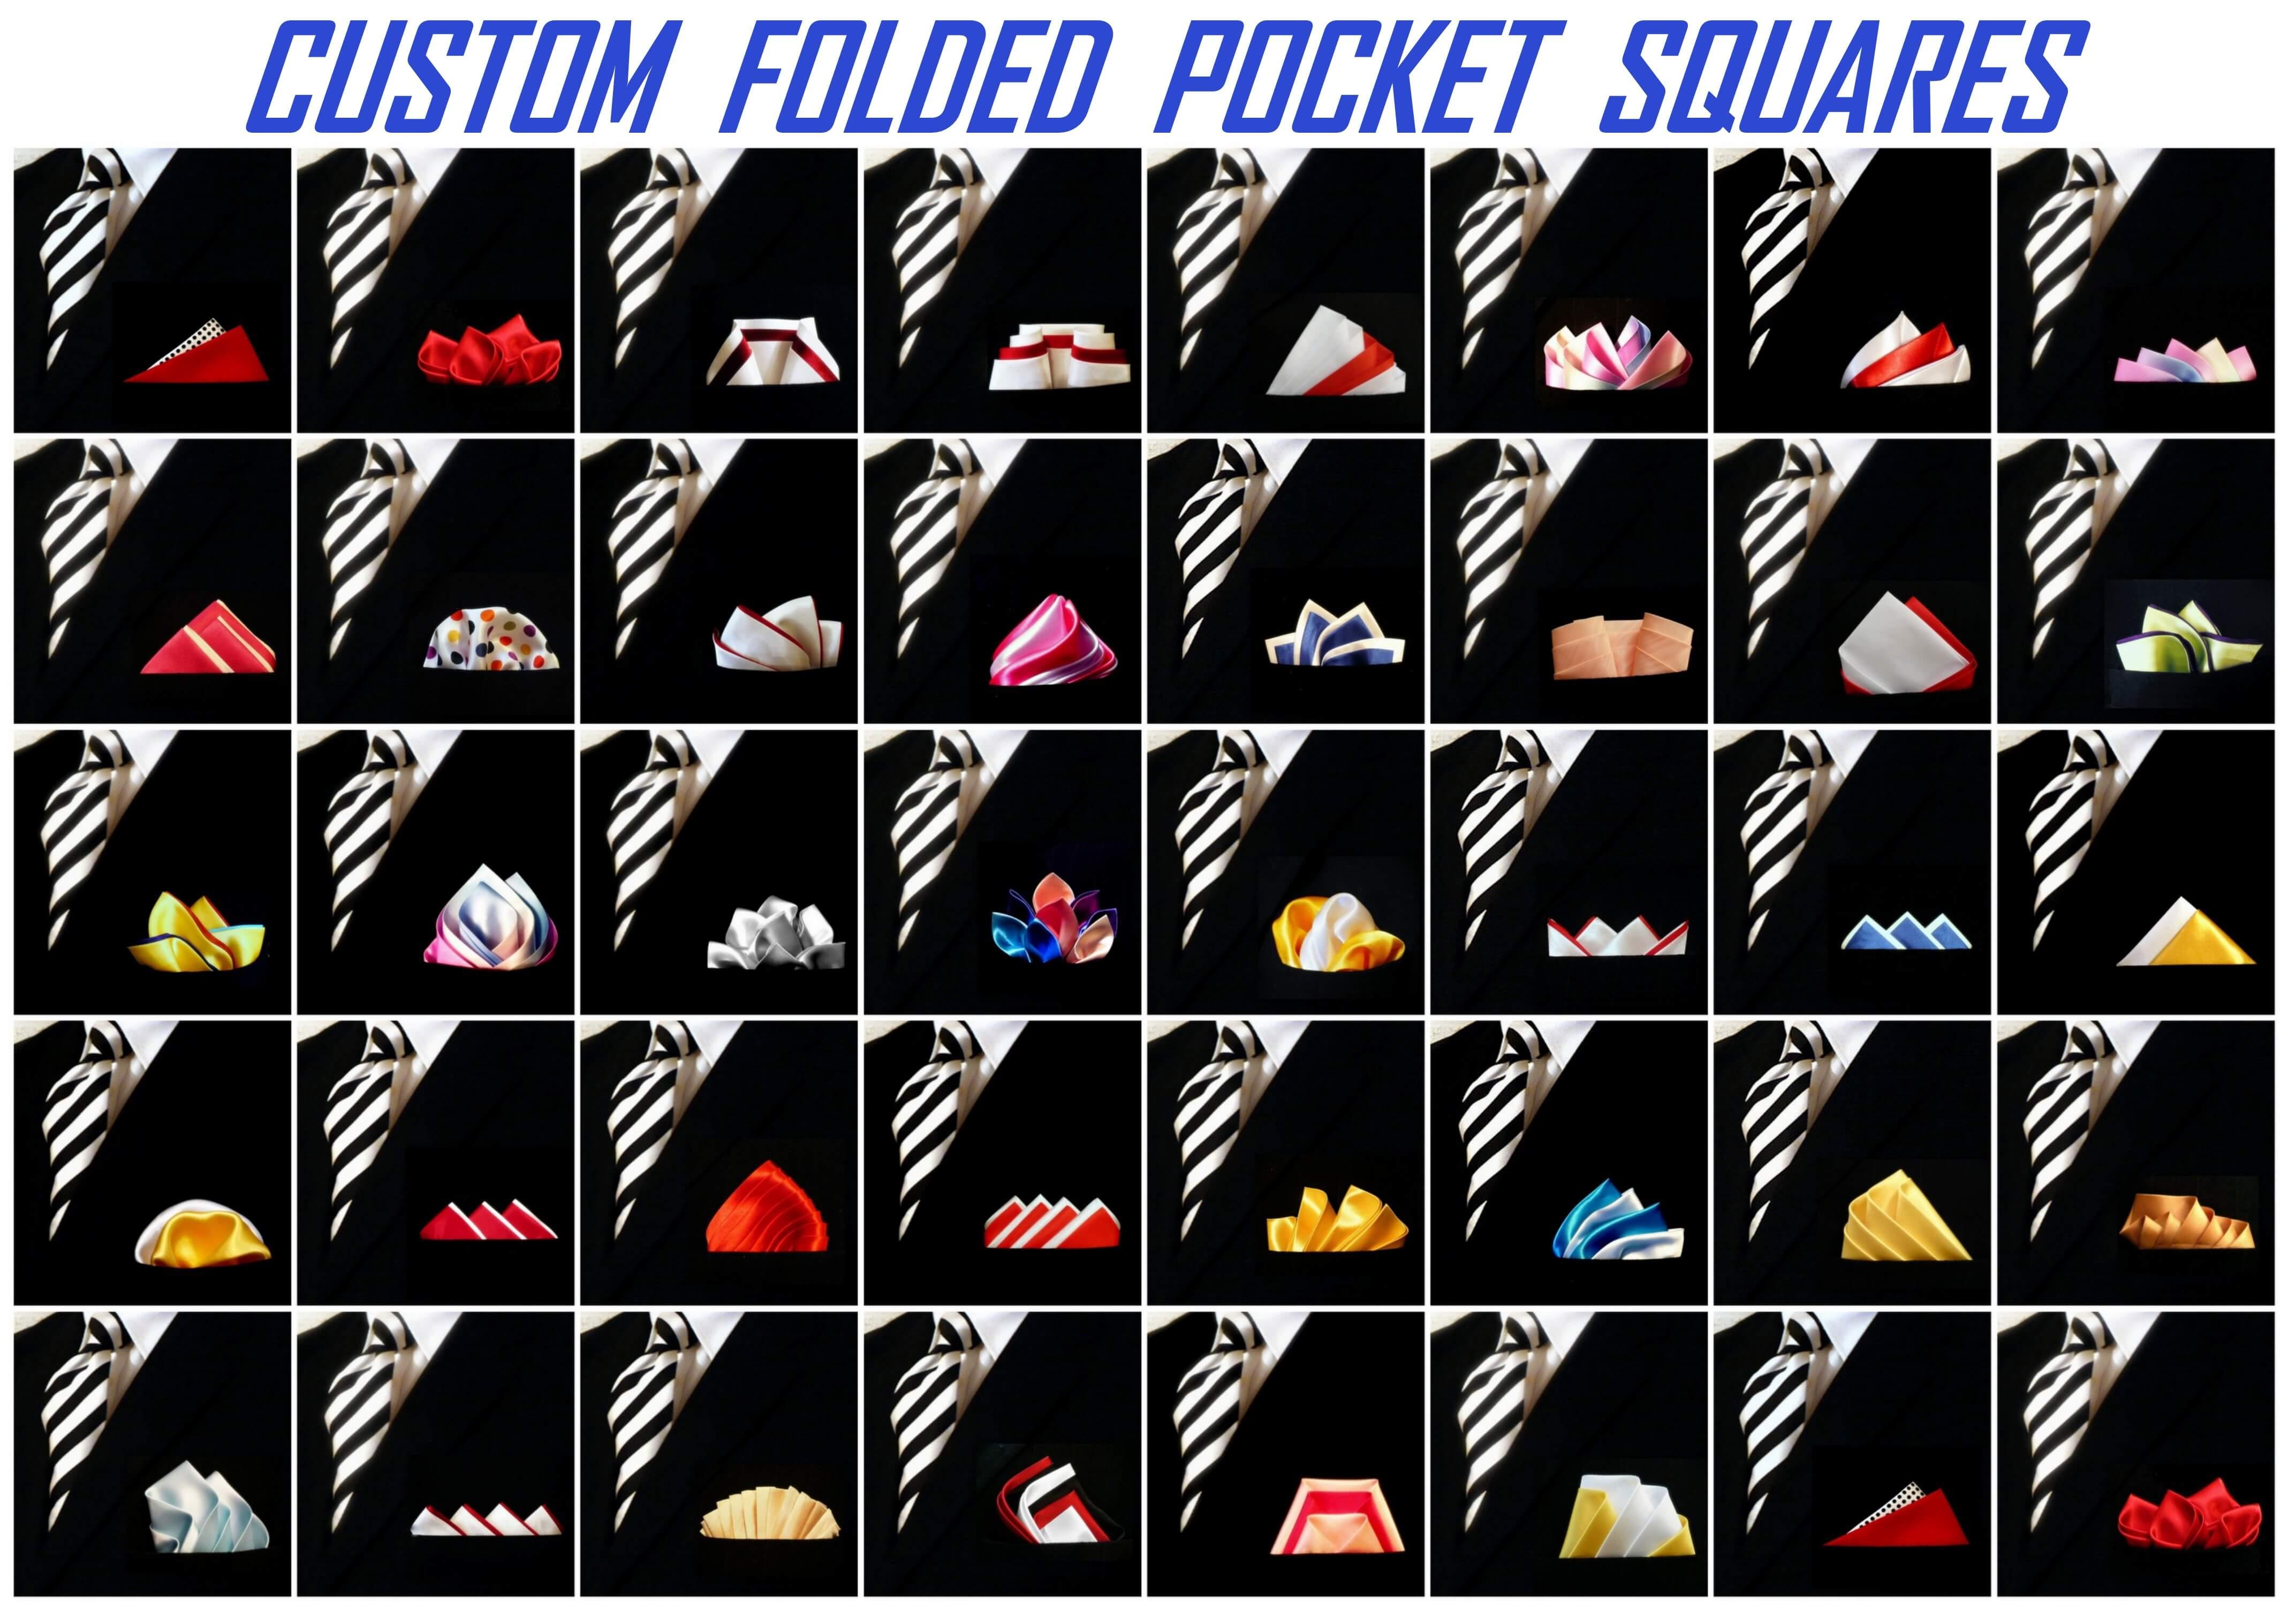 collages-for-website-001.jpg